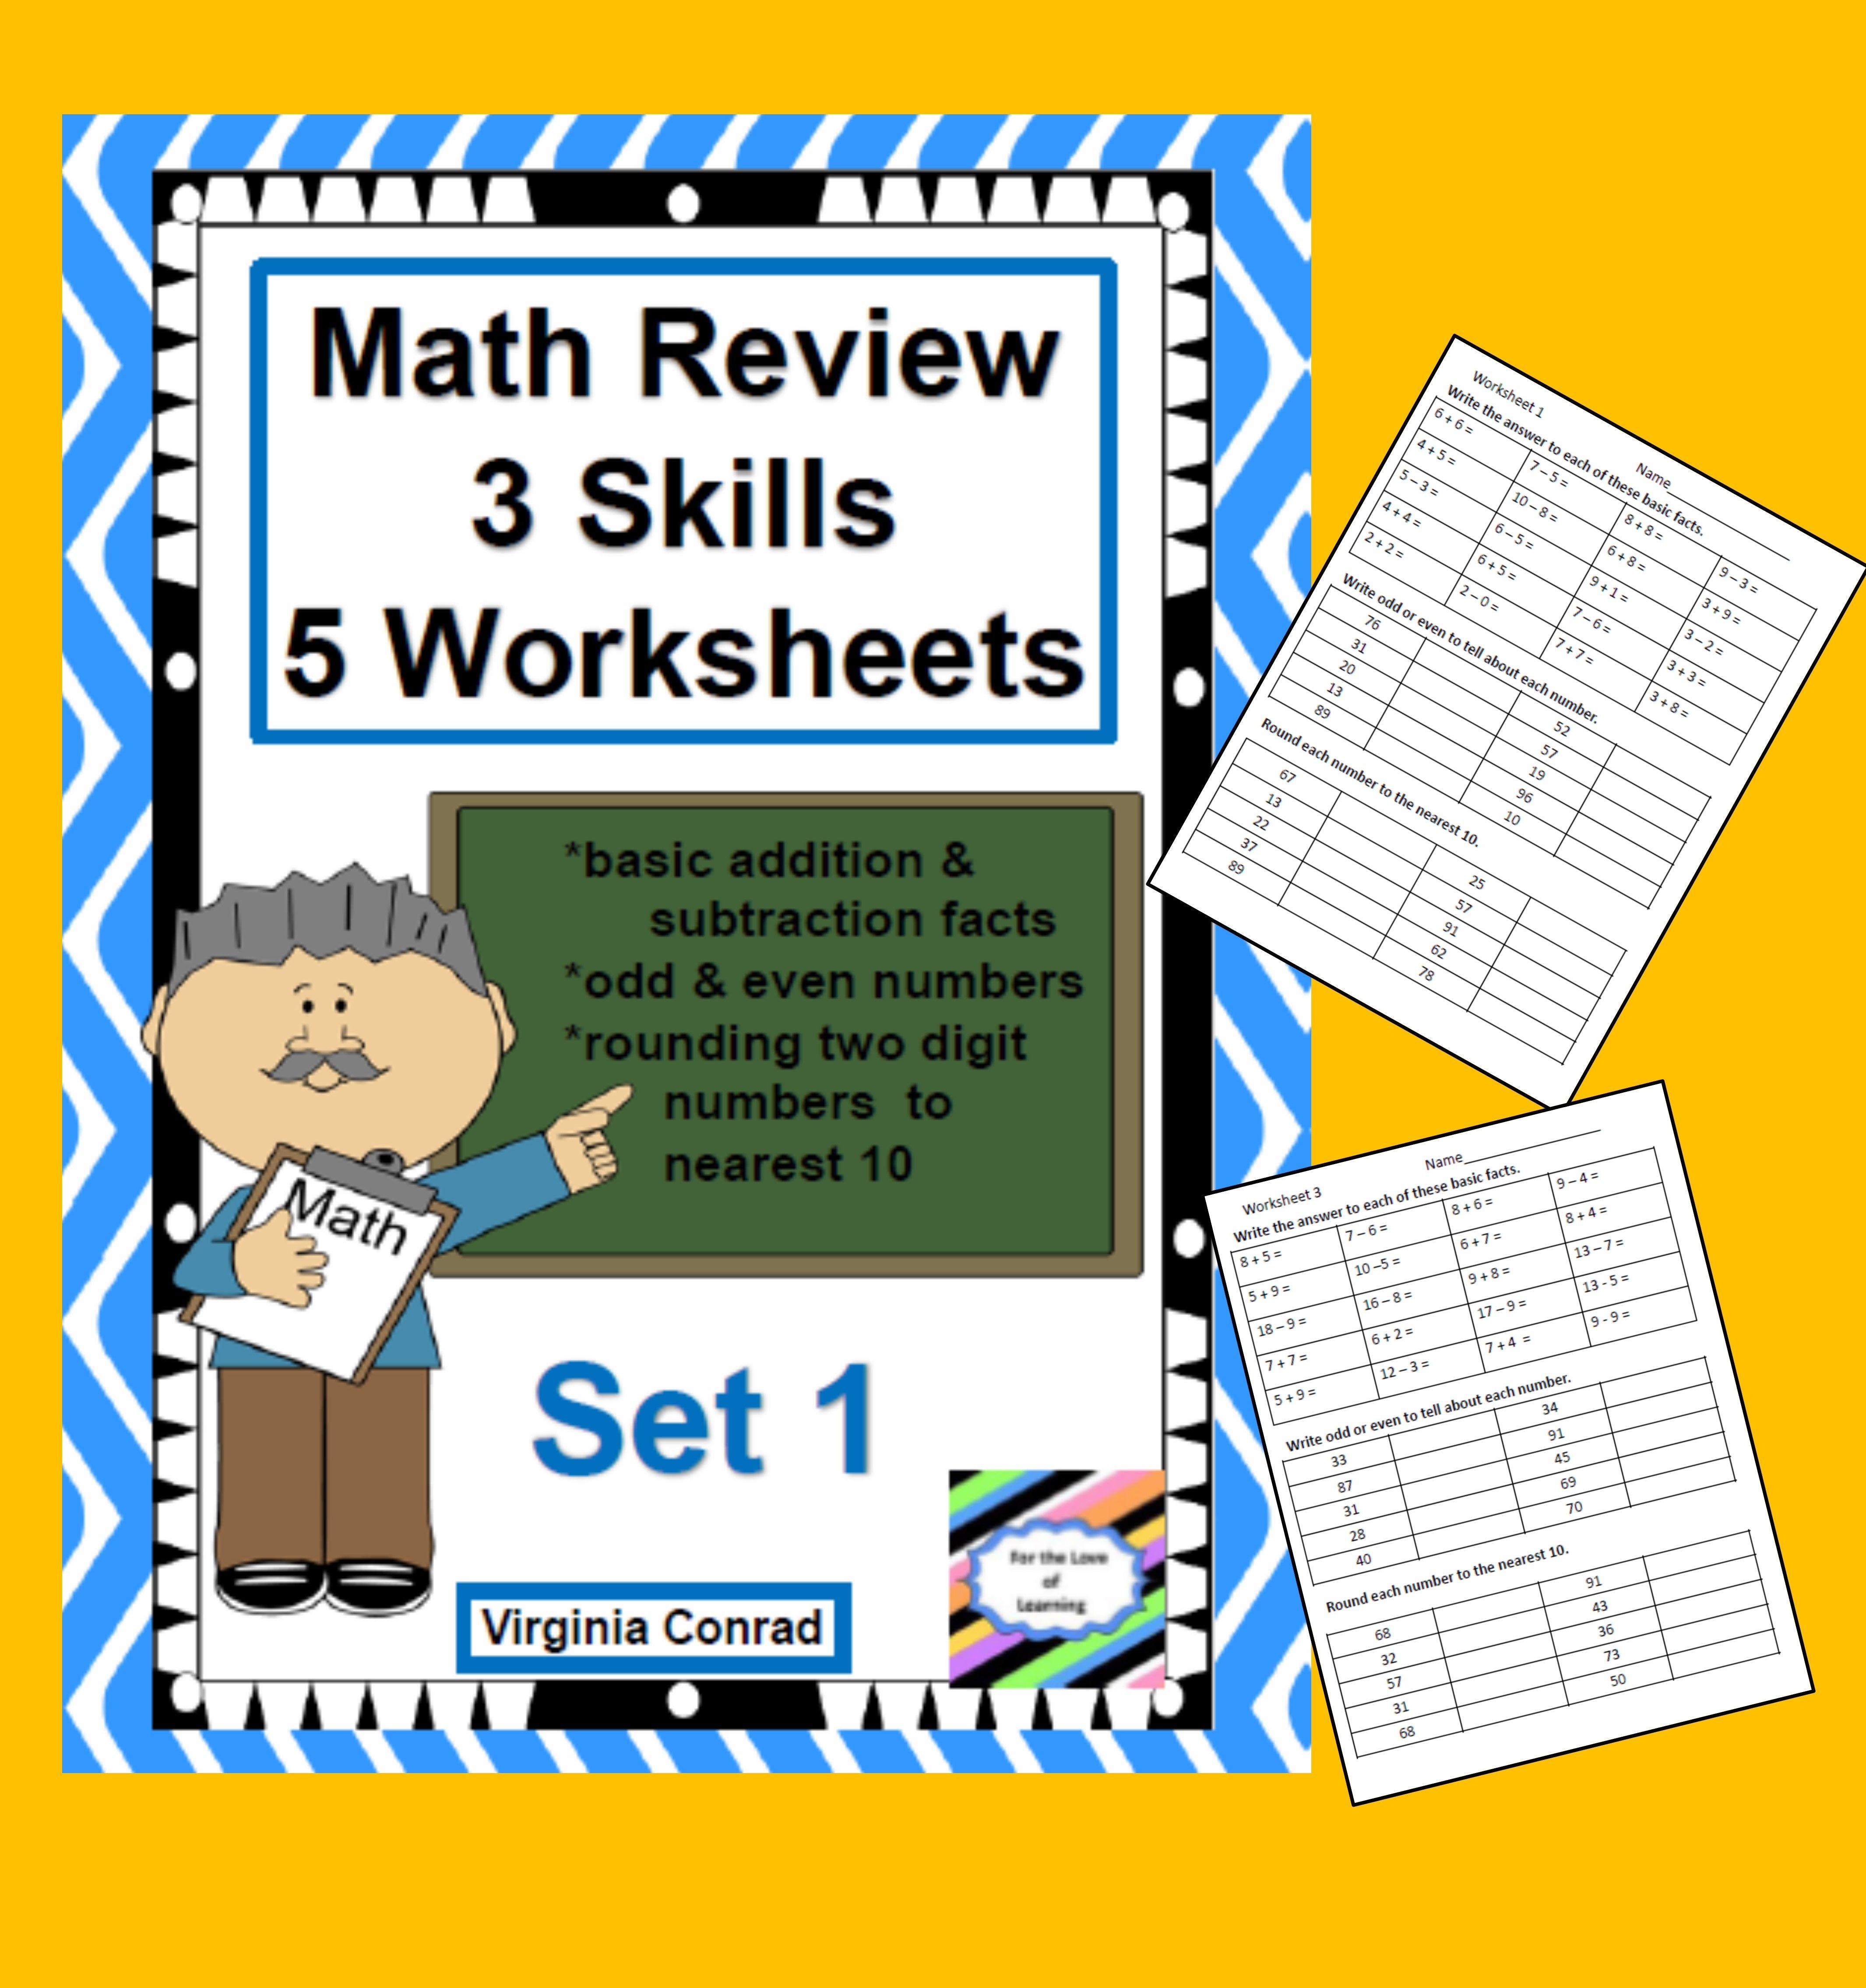 Math Review Worksheets: 3 Skills For 5 Days--Set 1 | Basic math ...